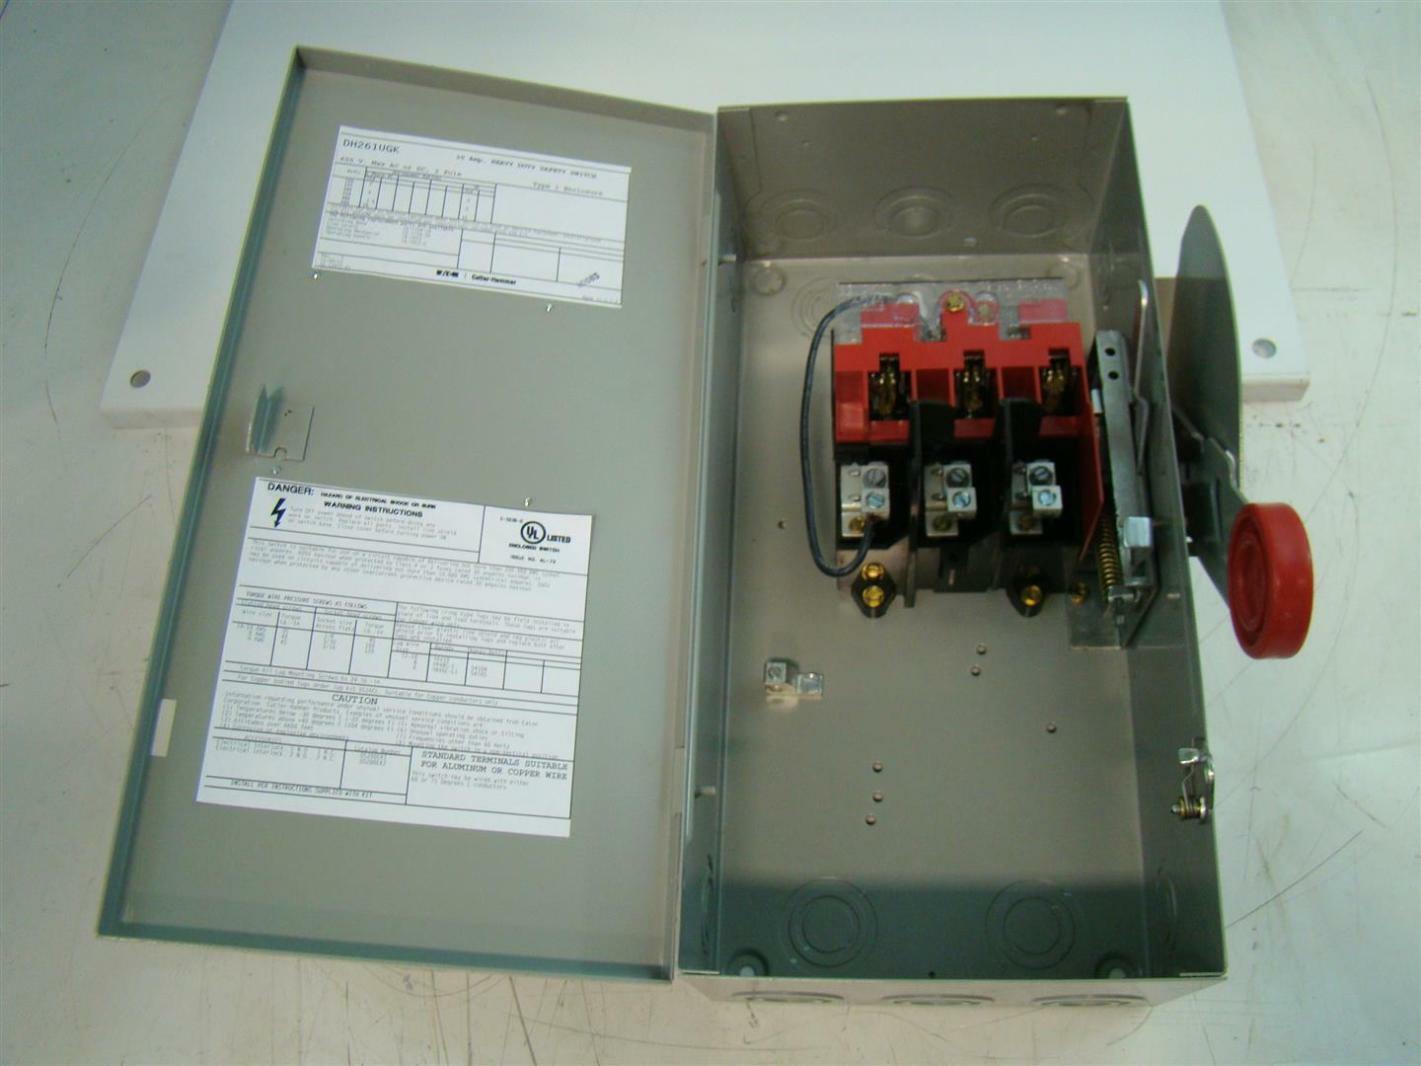 Eaton Cutler Hammer Heavy Duty Safety Switch 30 Amp 600V 2 Pole ...